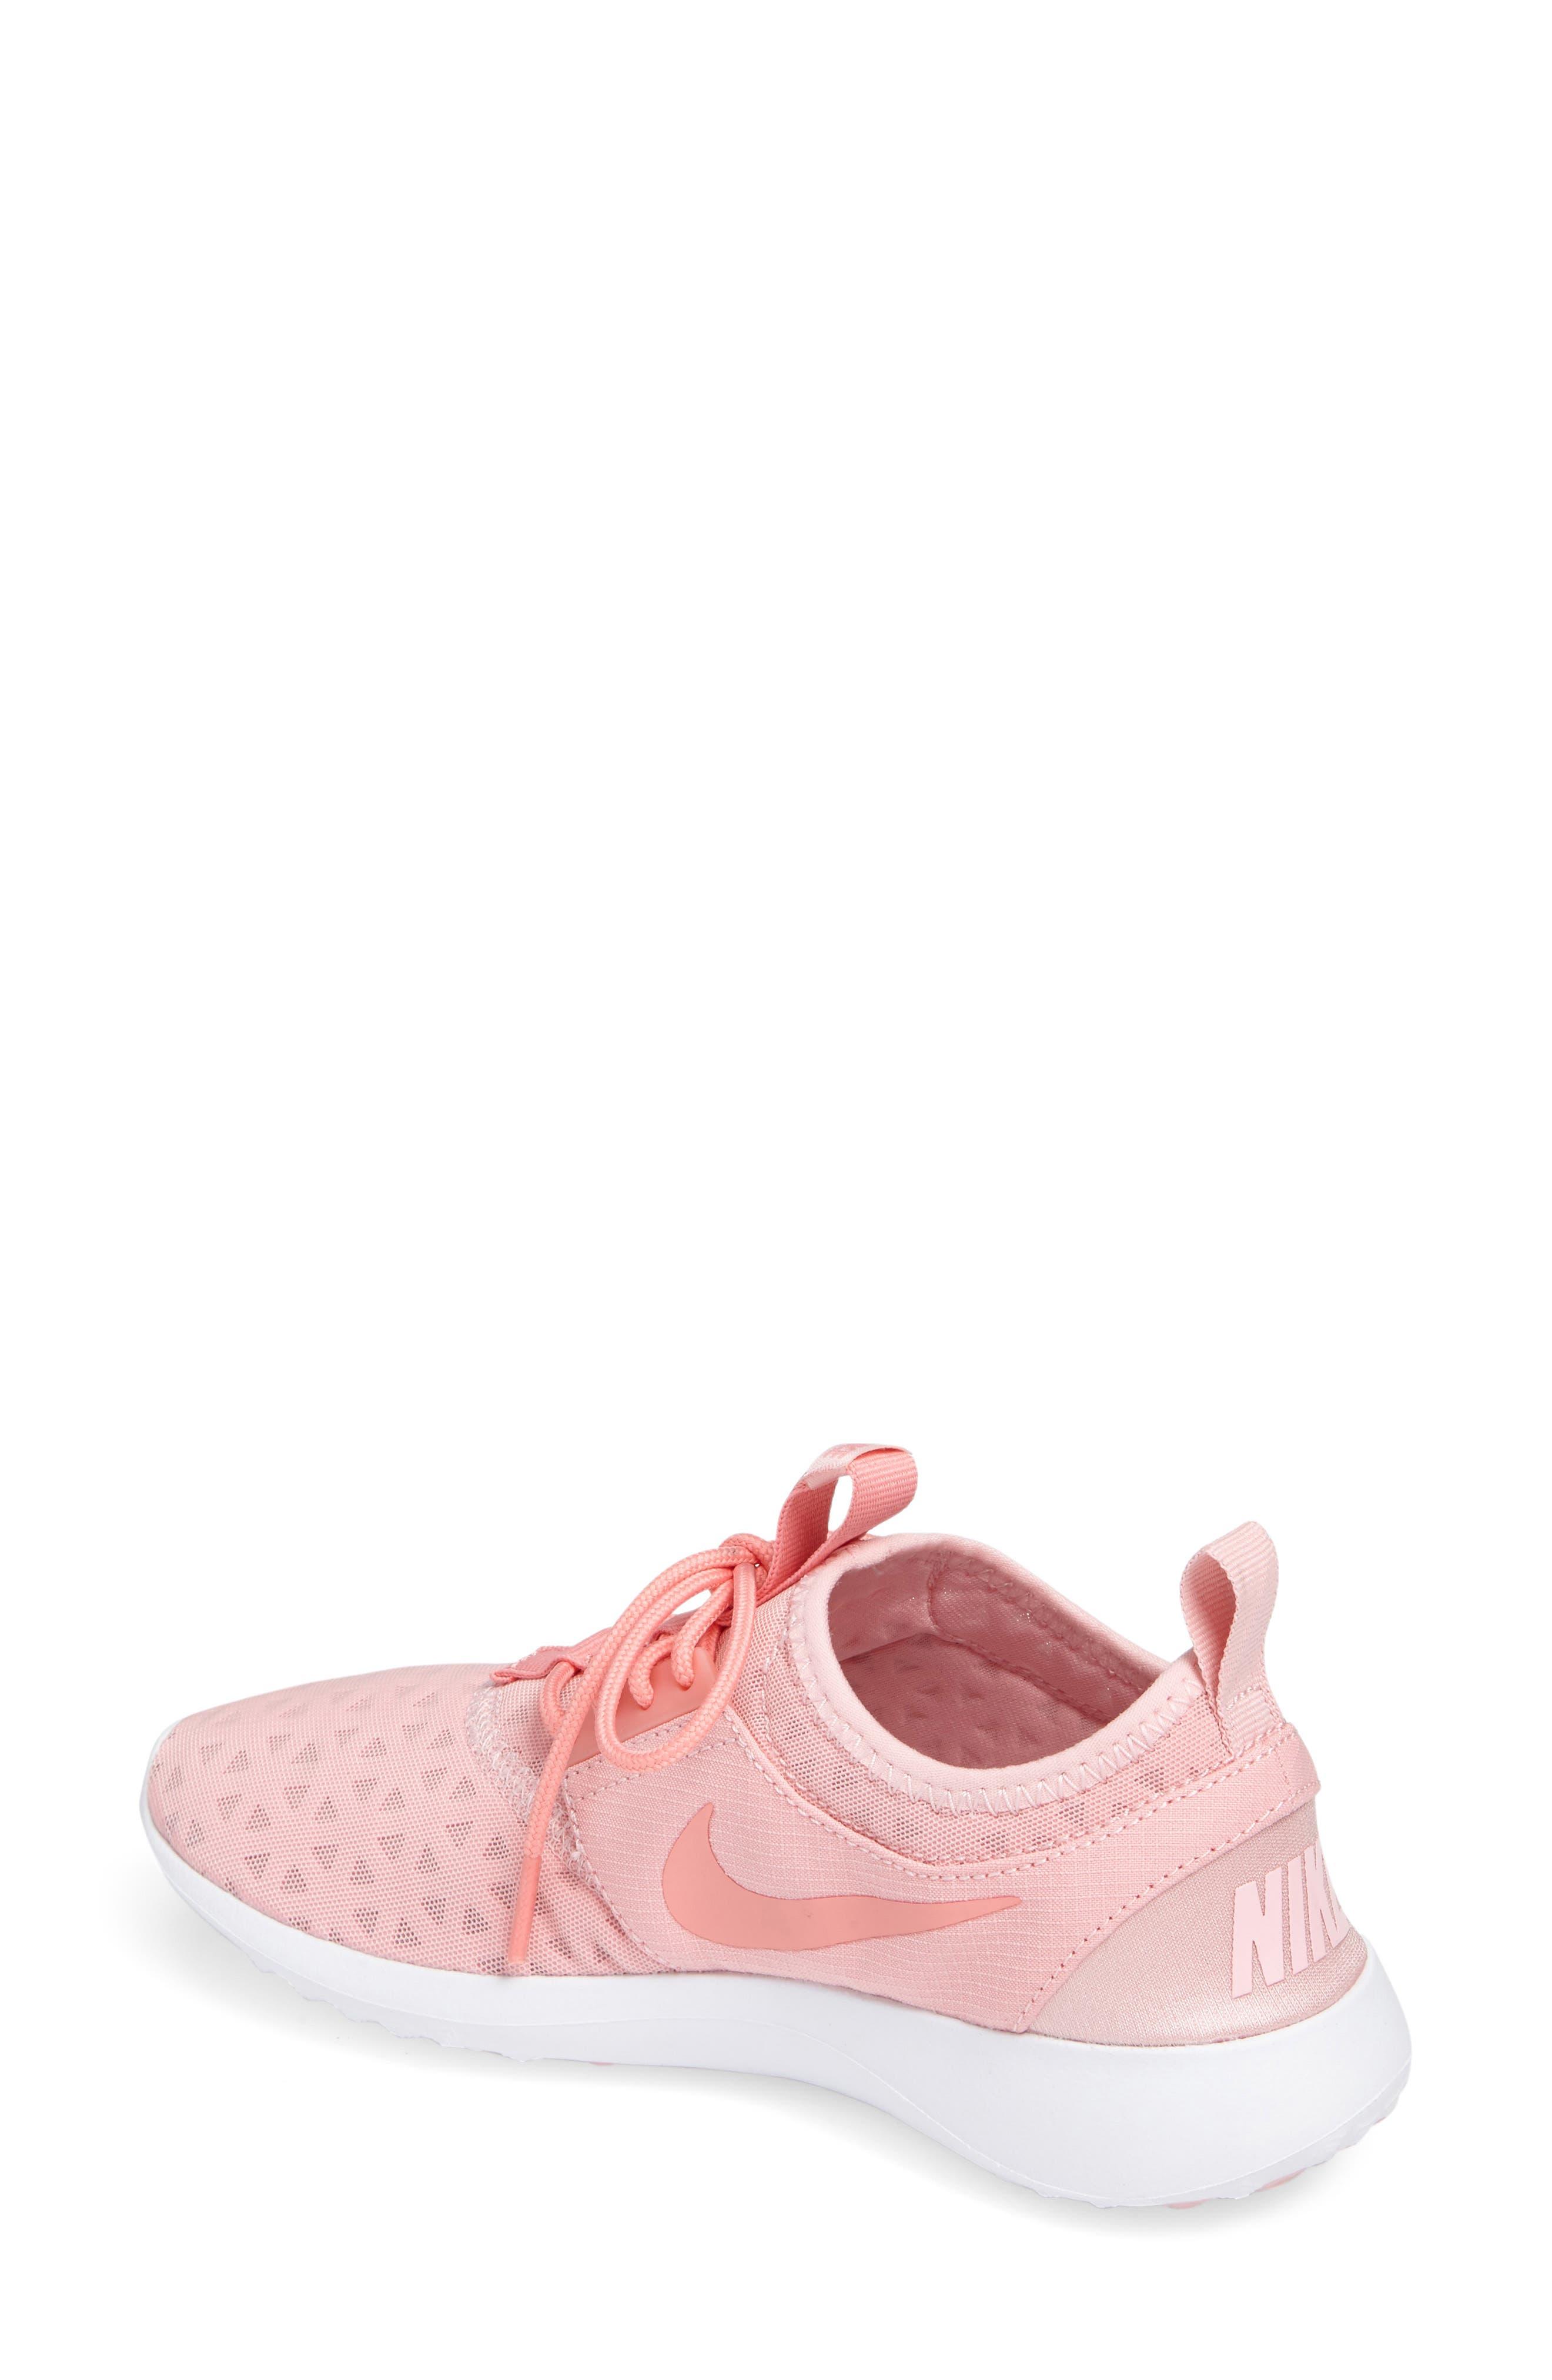 ,                             'Juvenate' Sneaker,                             Alternate thumbnail 279, color,                             650